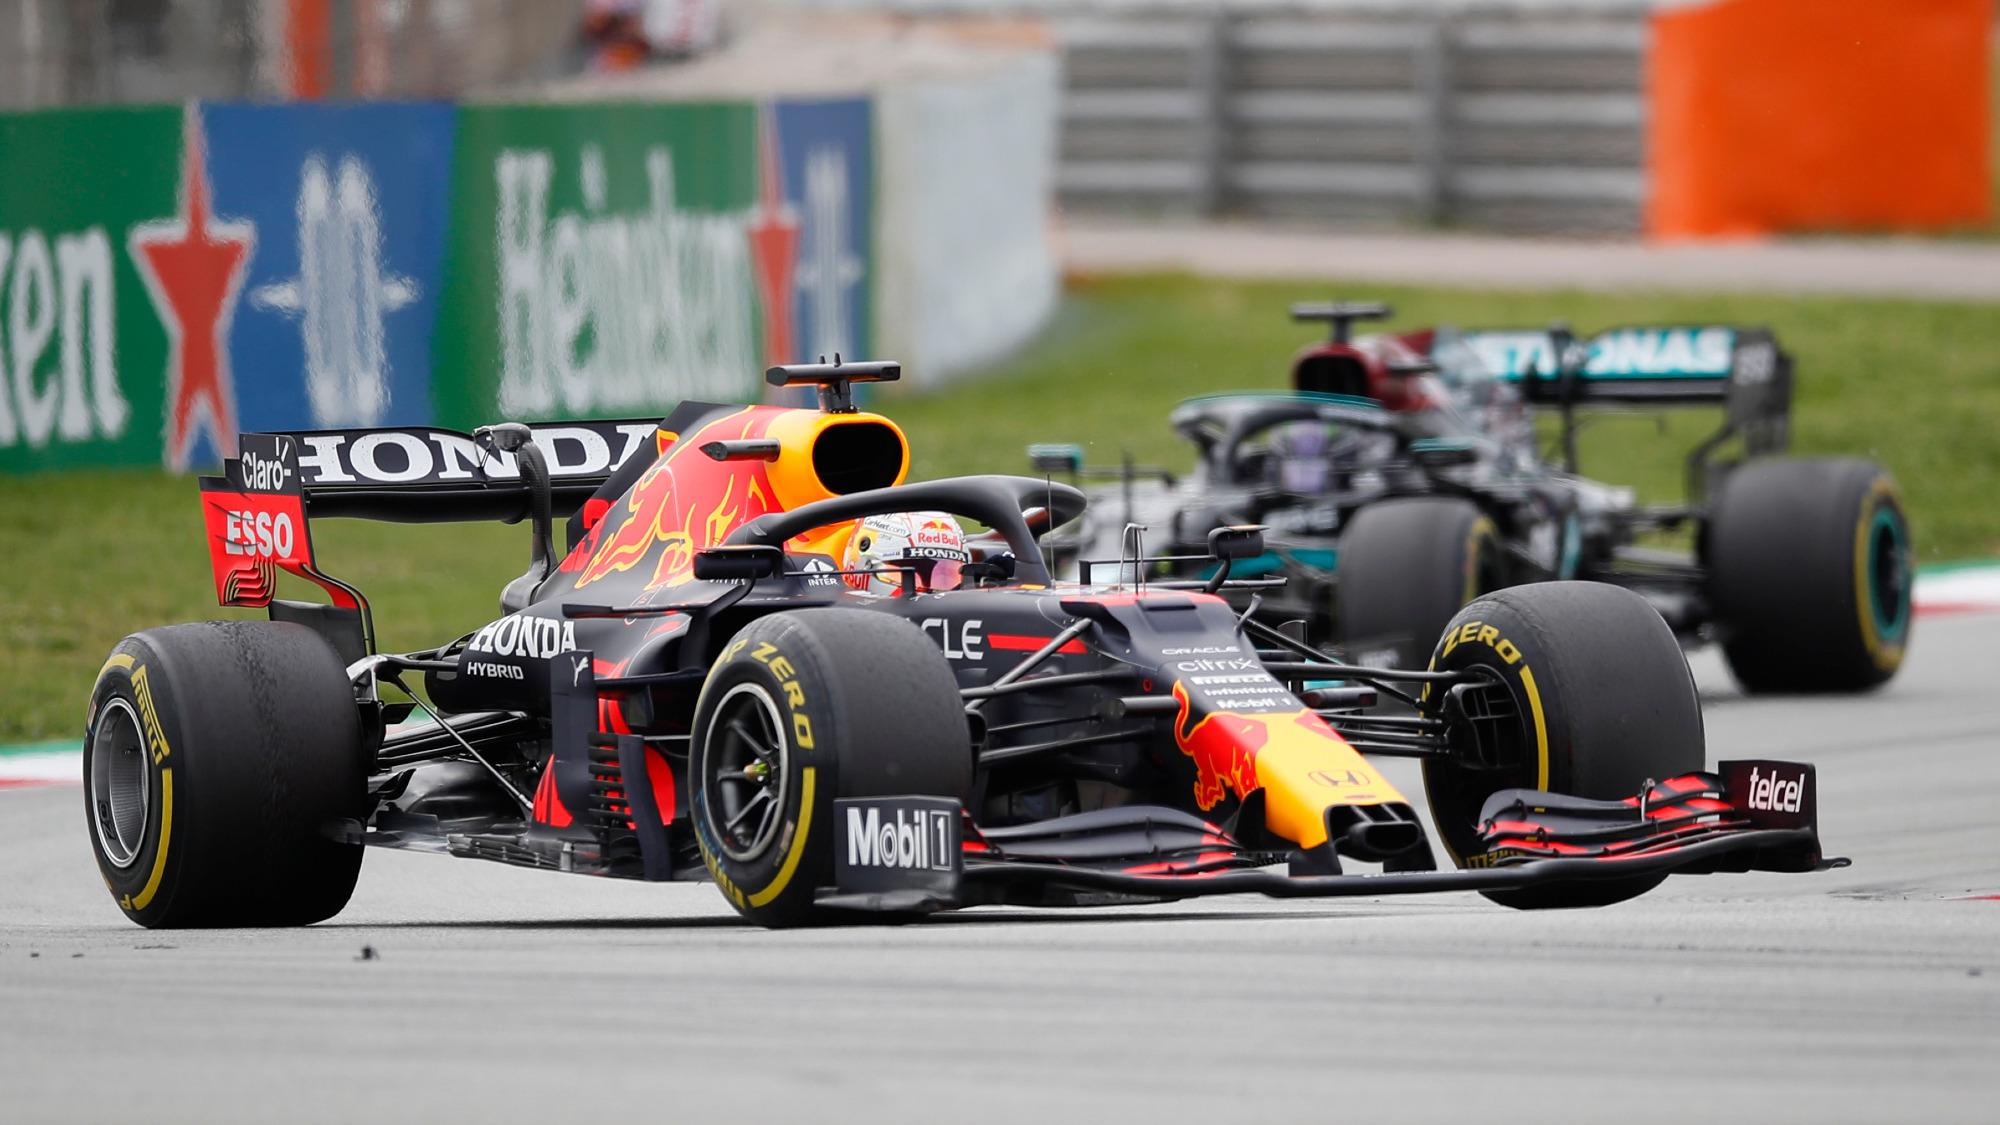 Max Verstappen, 2021 Spanish GP